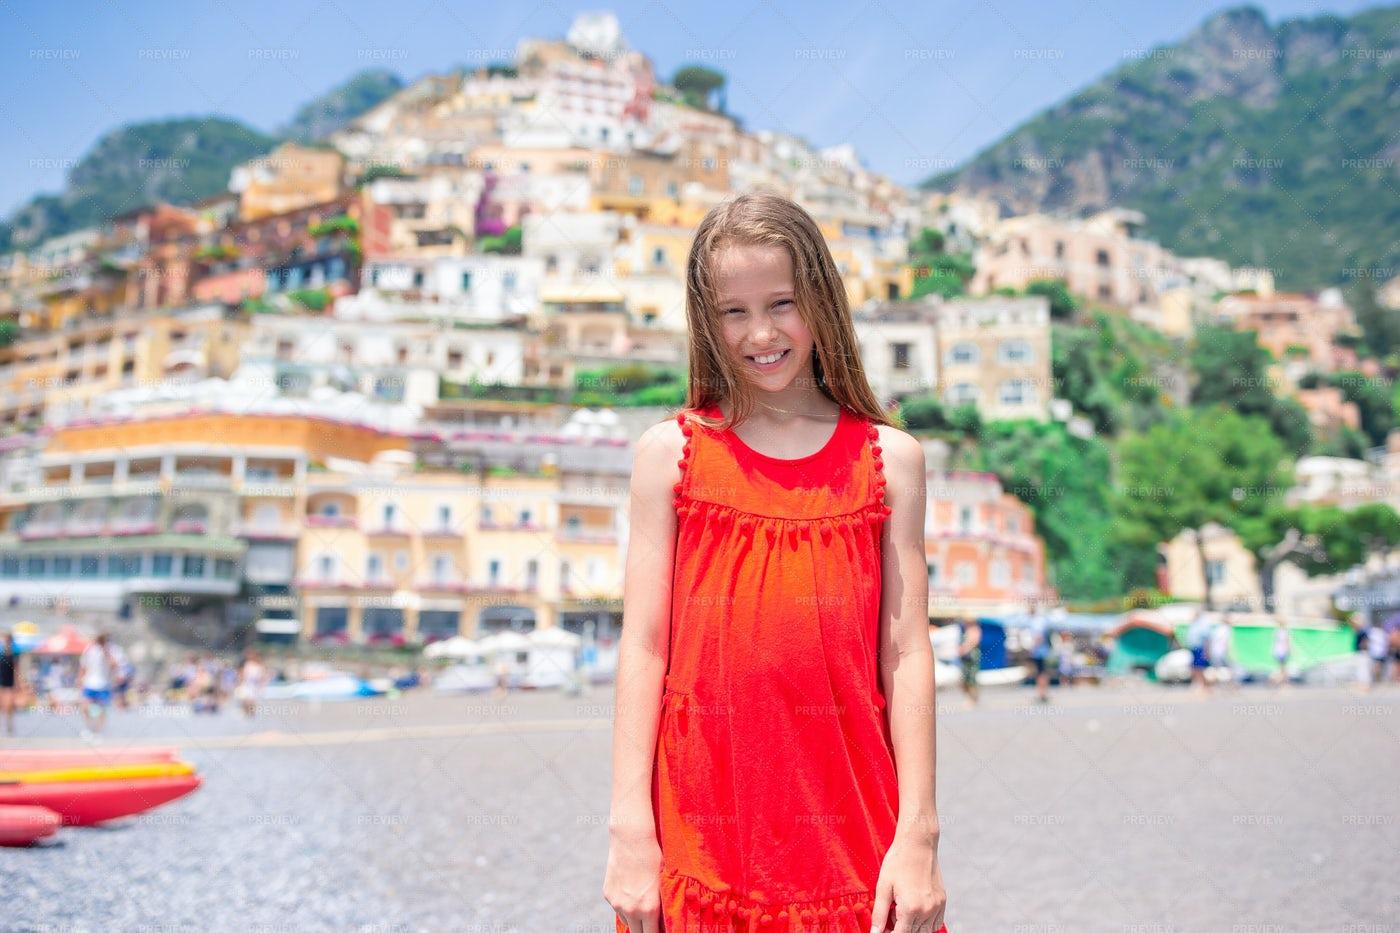 Tourist Girl On A Warm Day: Stock Photos